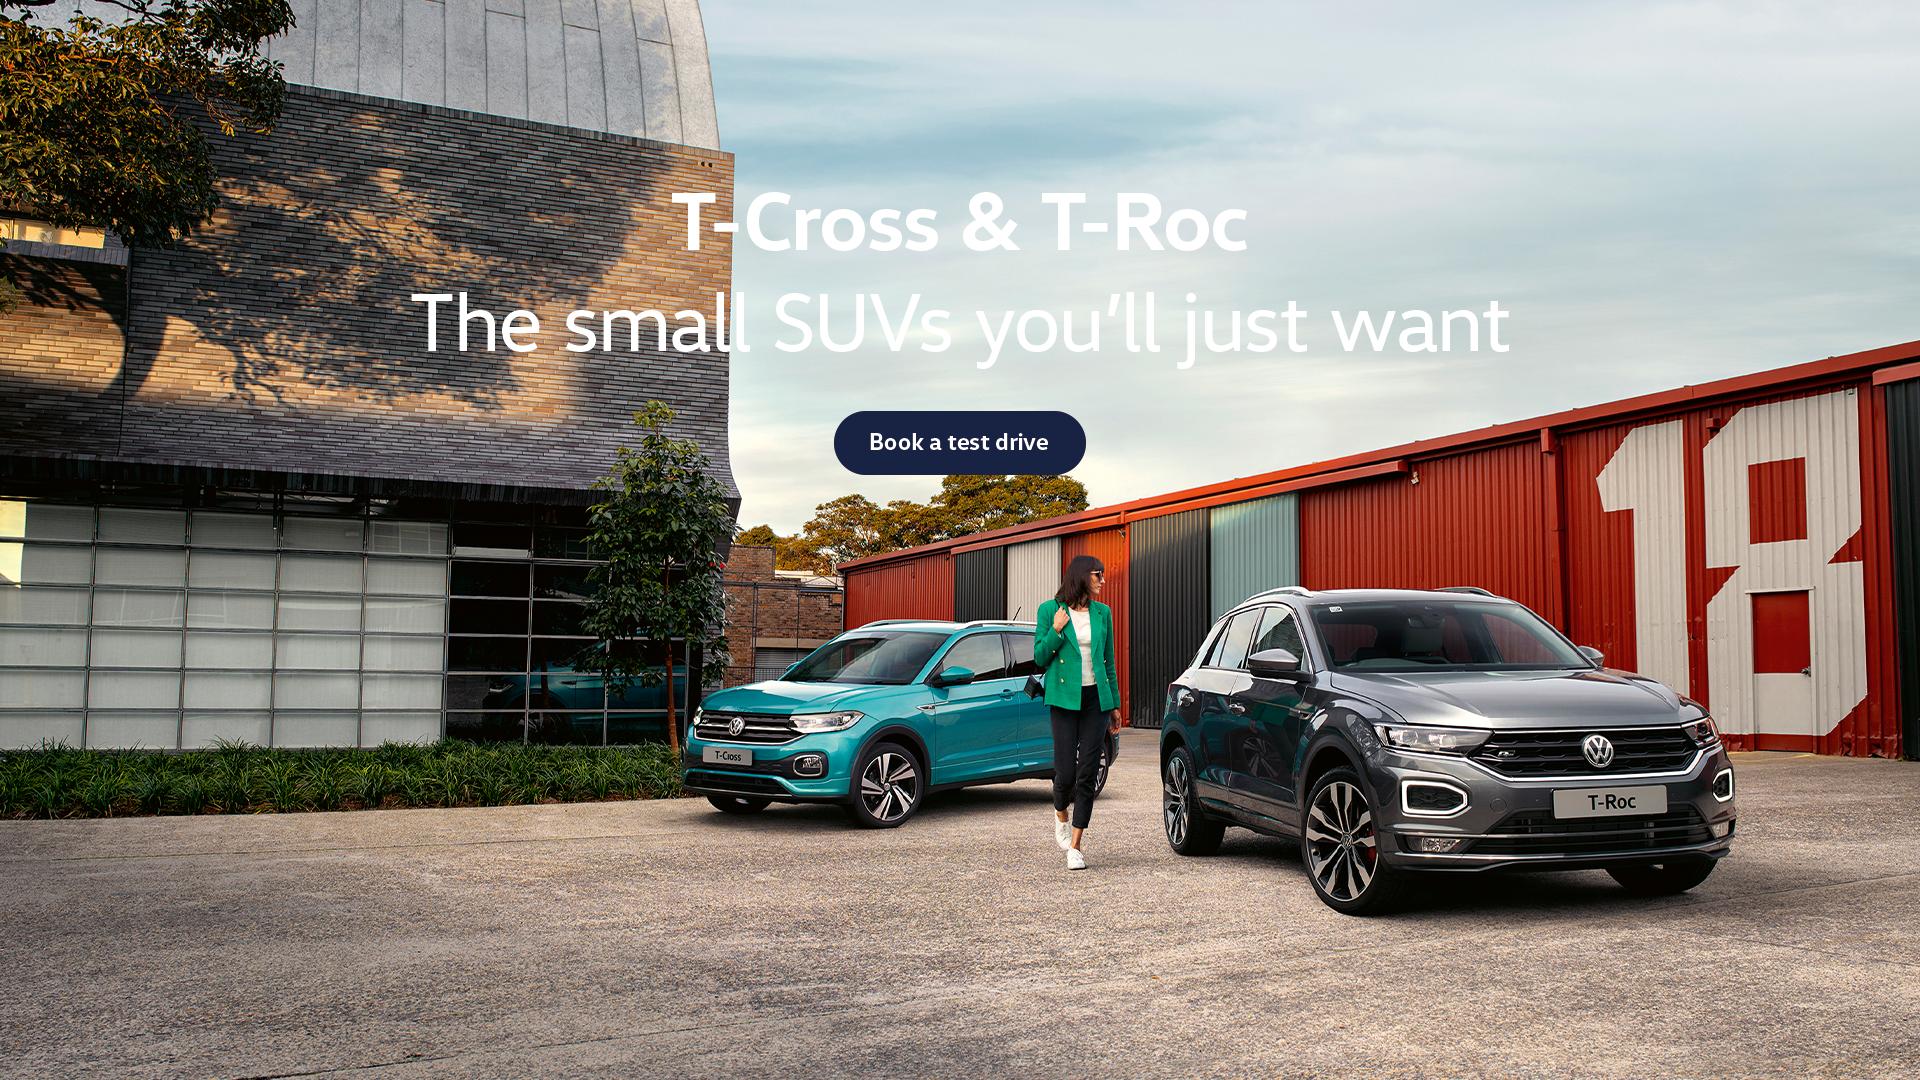 Volkswagen Small SUV range. Test drive today at Westco Volkswagen